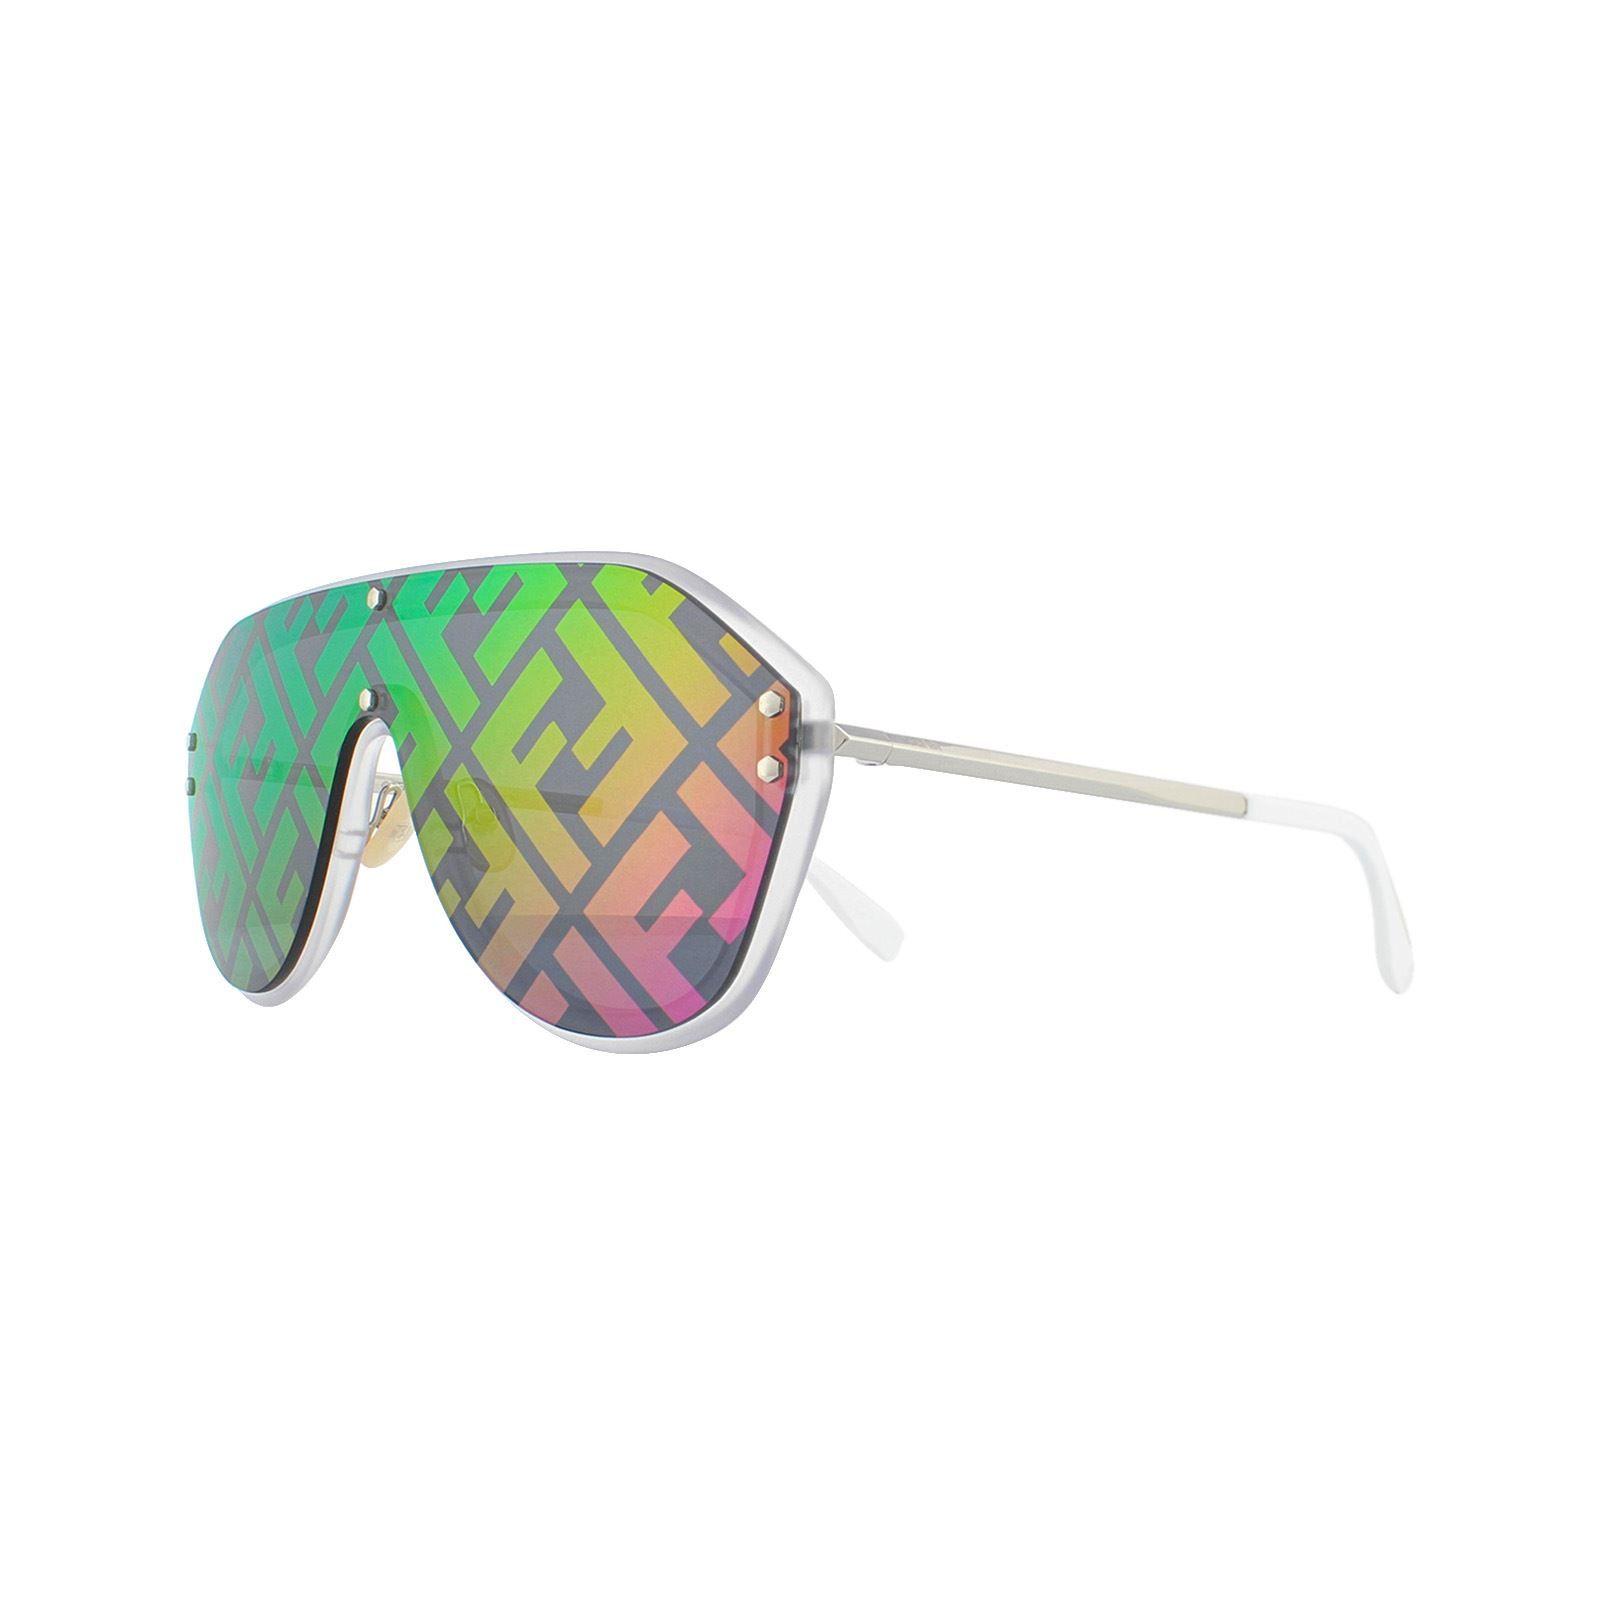 Fendi Sunglasses M0039/G/S F74 R3 Opal White with Silver White Blue with Monogram Logo Fuchsia Mirror